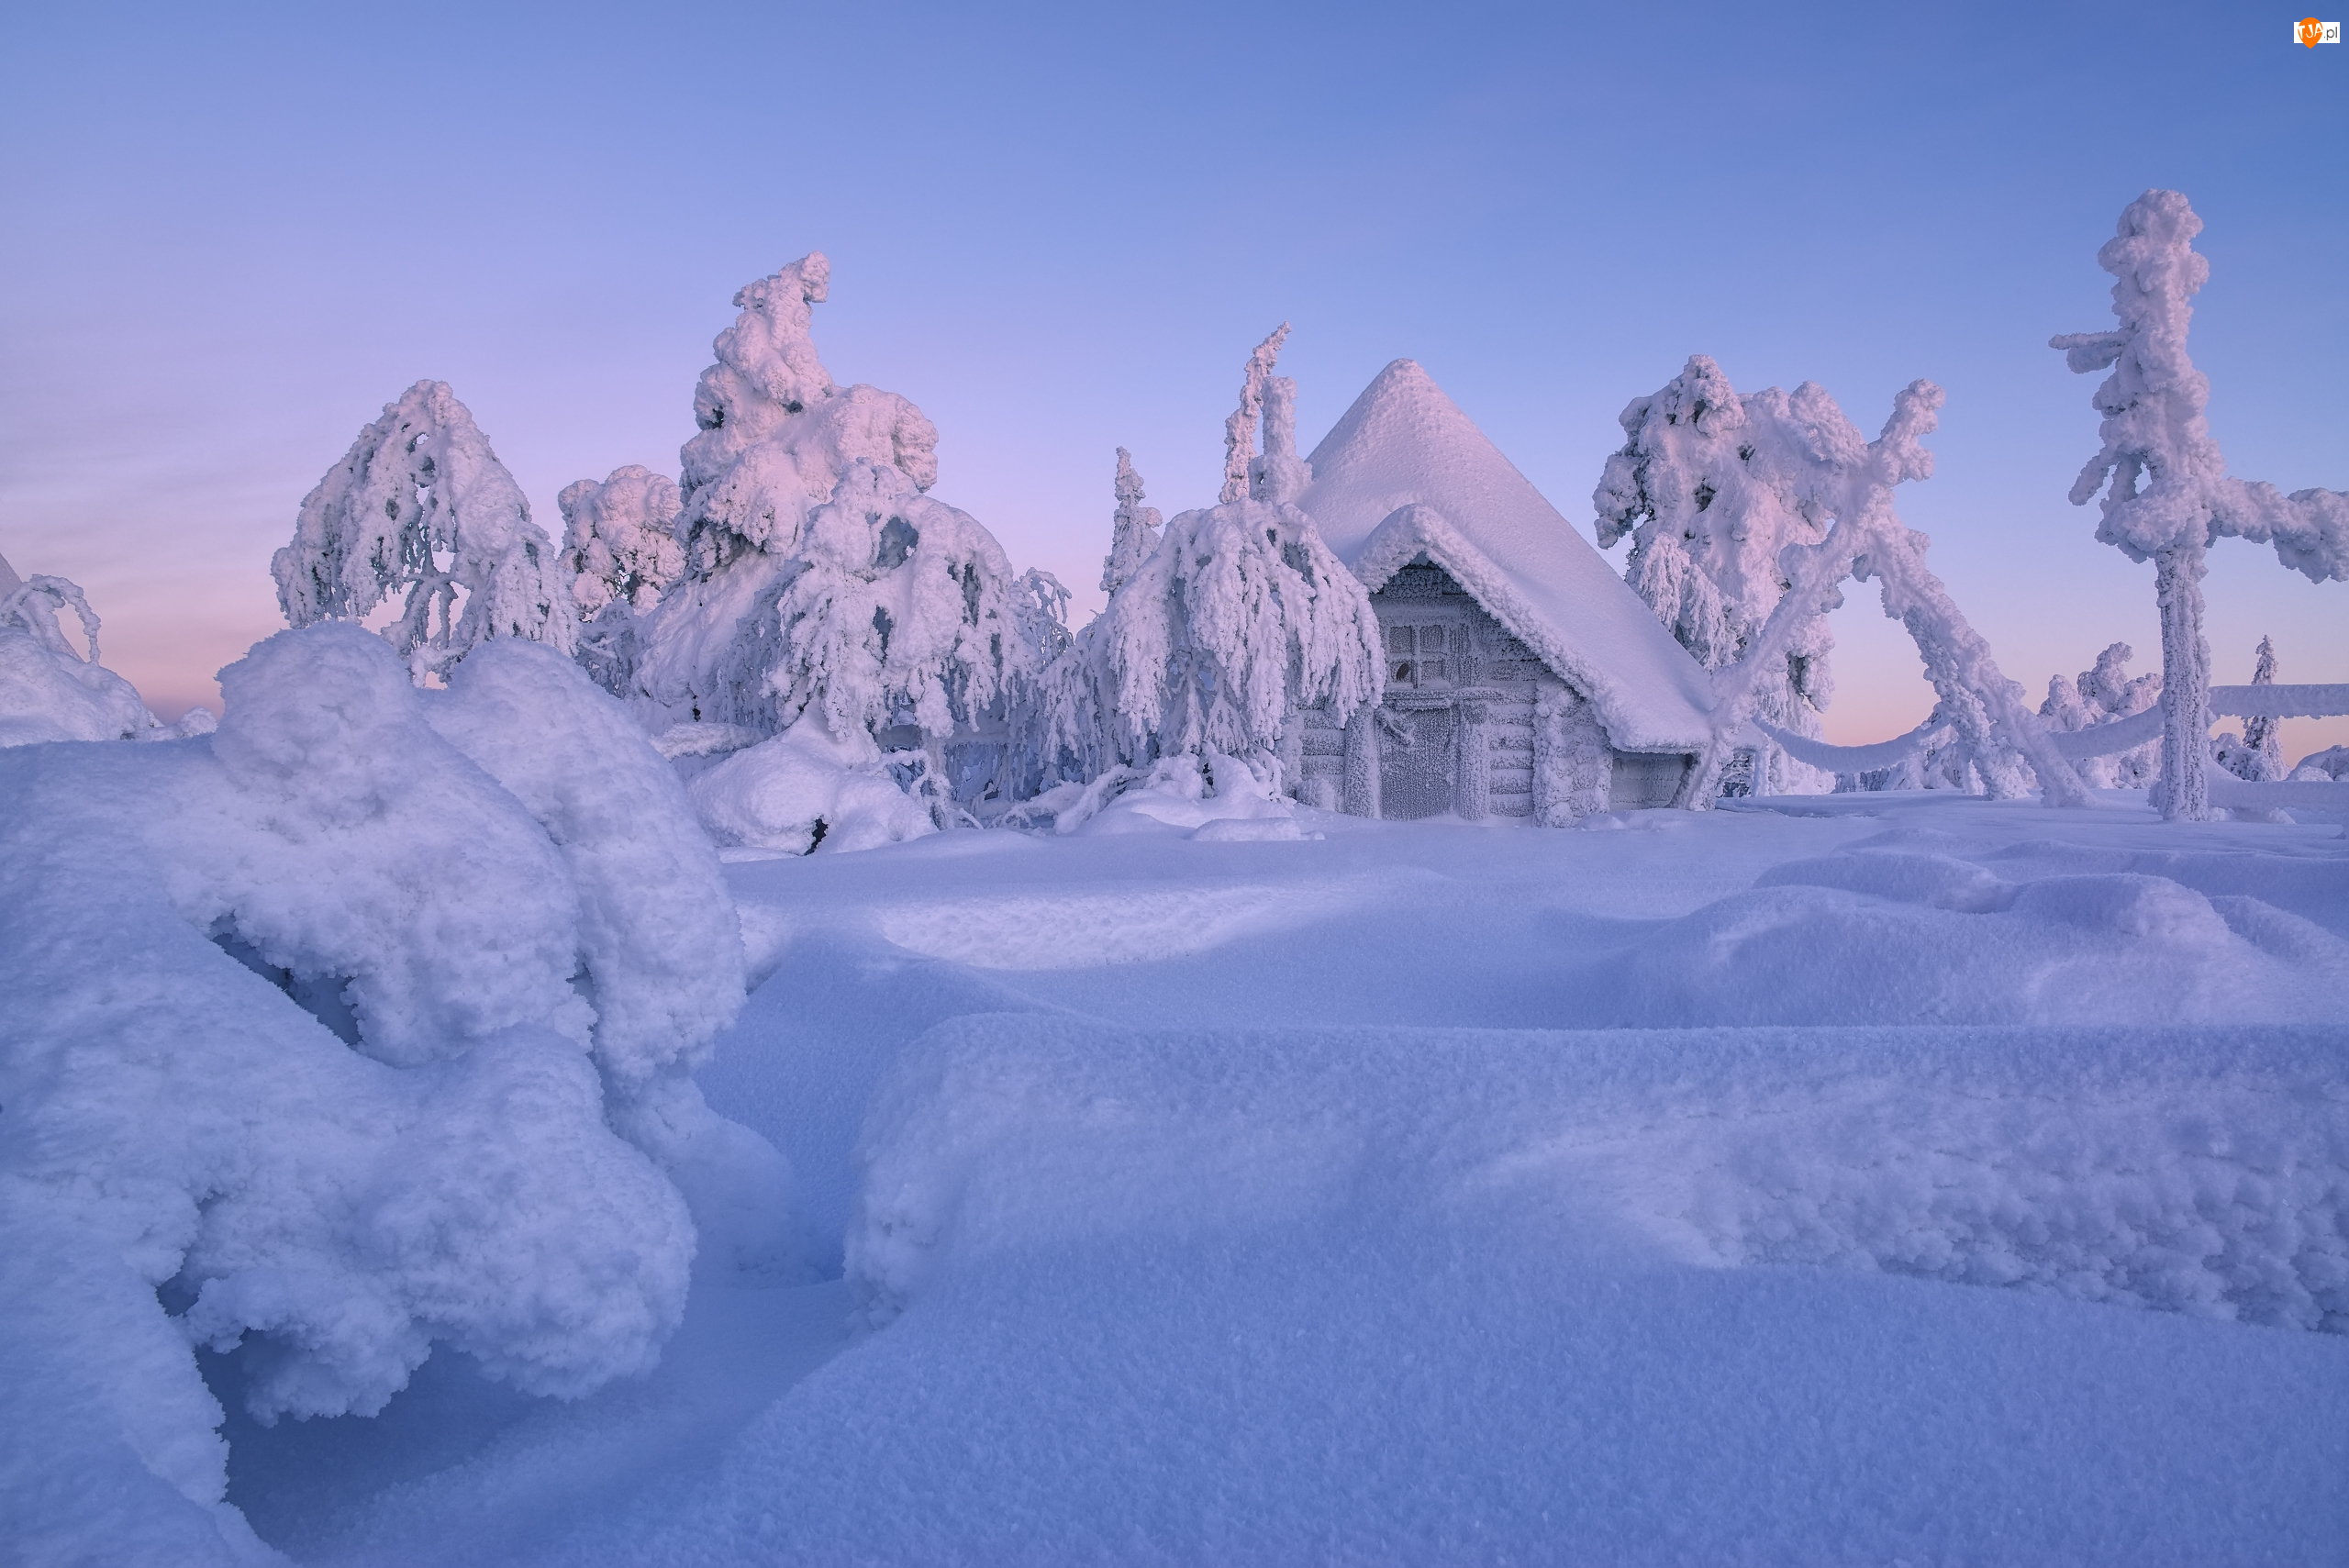 Dom, Finlandia, Drzewa, Zima, Laponia